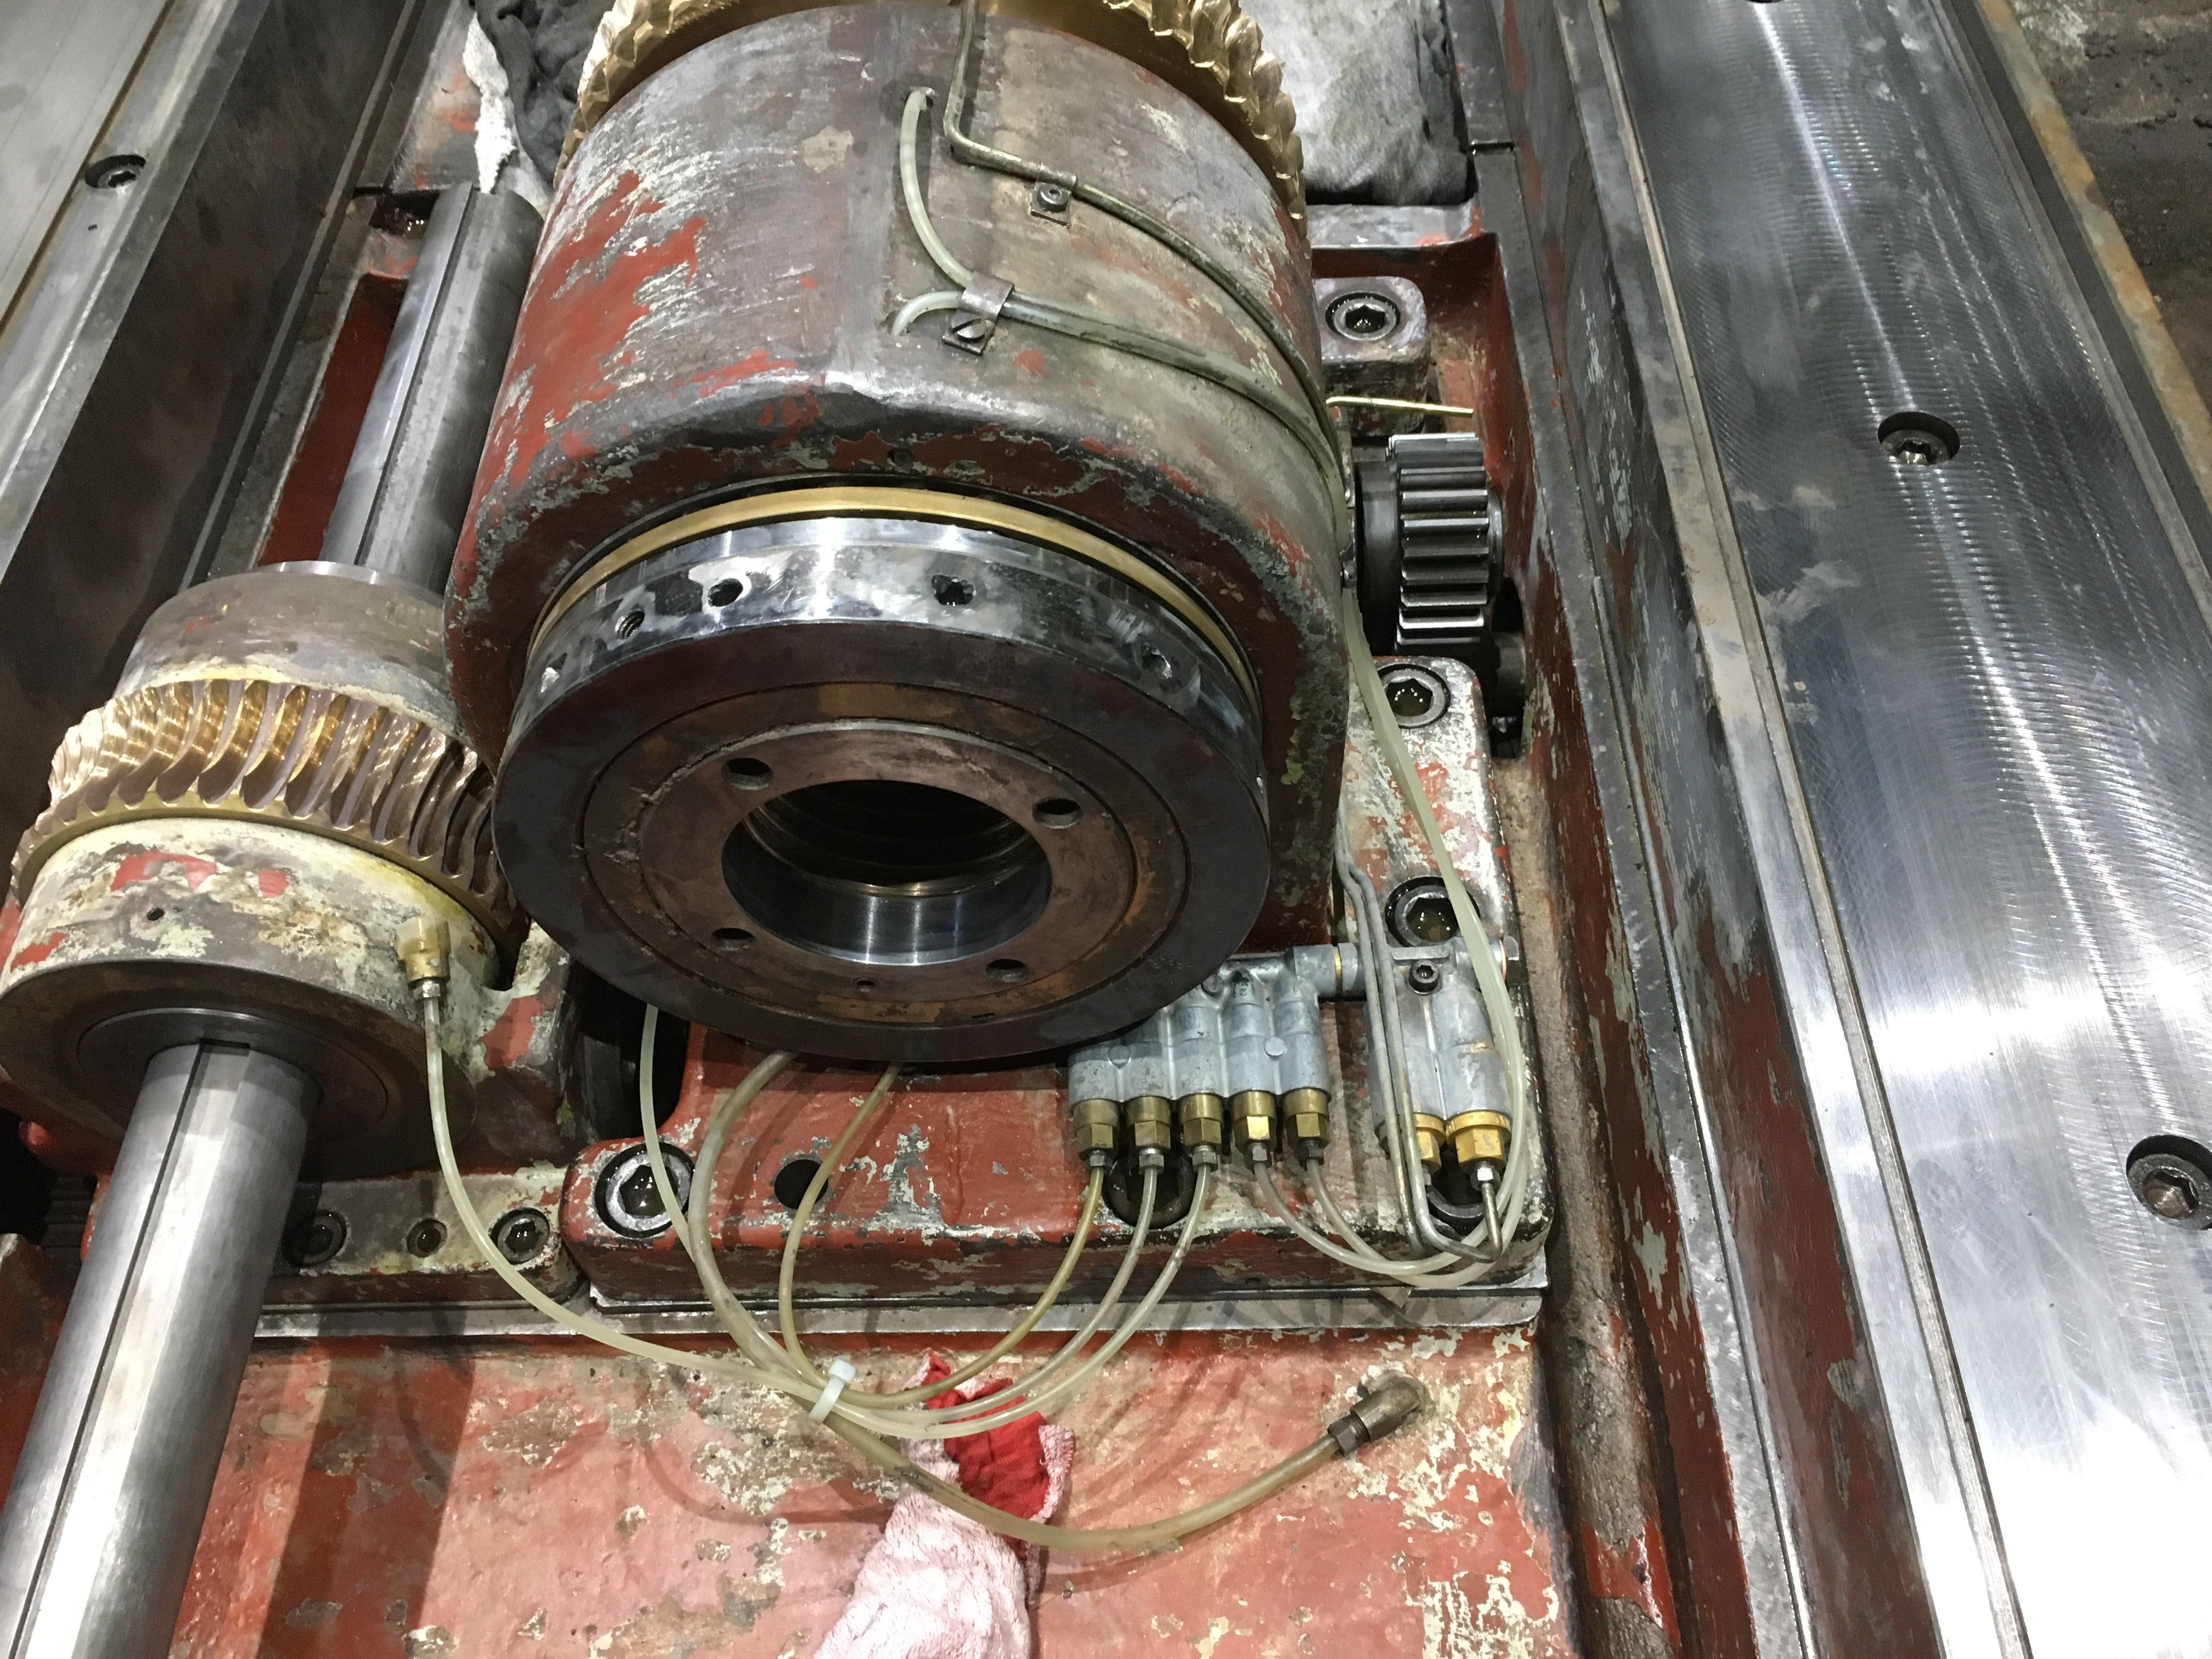 entretien-annuel-2019-rectifieuse-cylindres-waldrich5